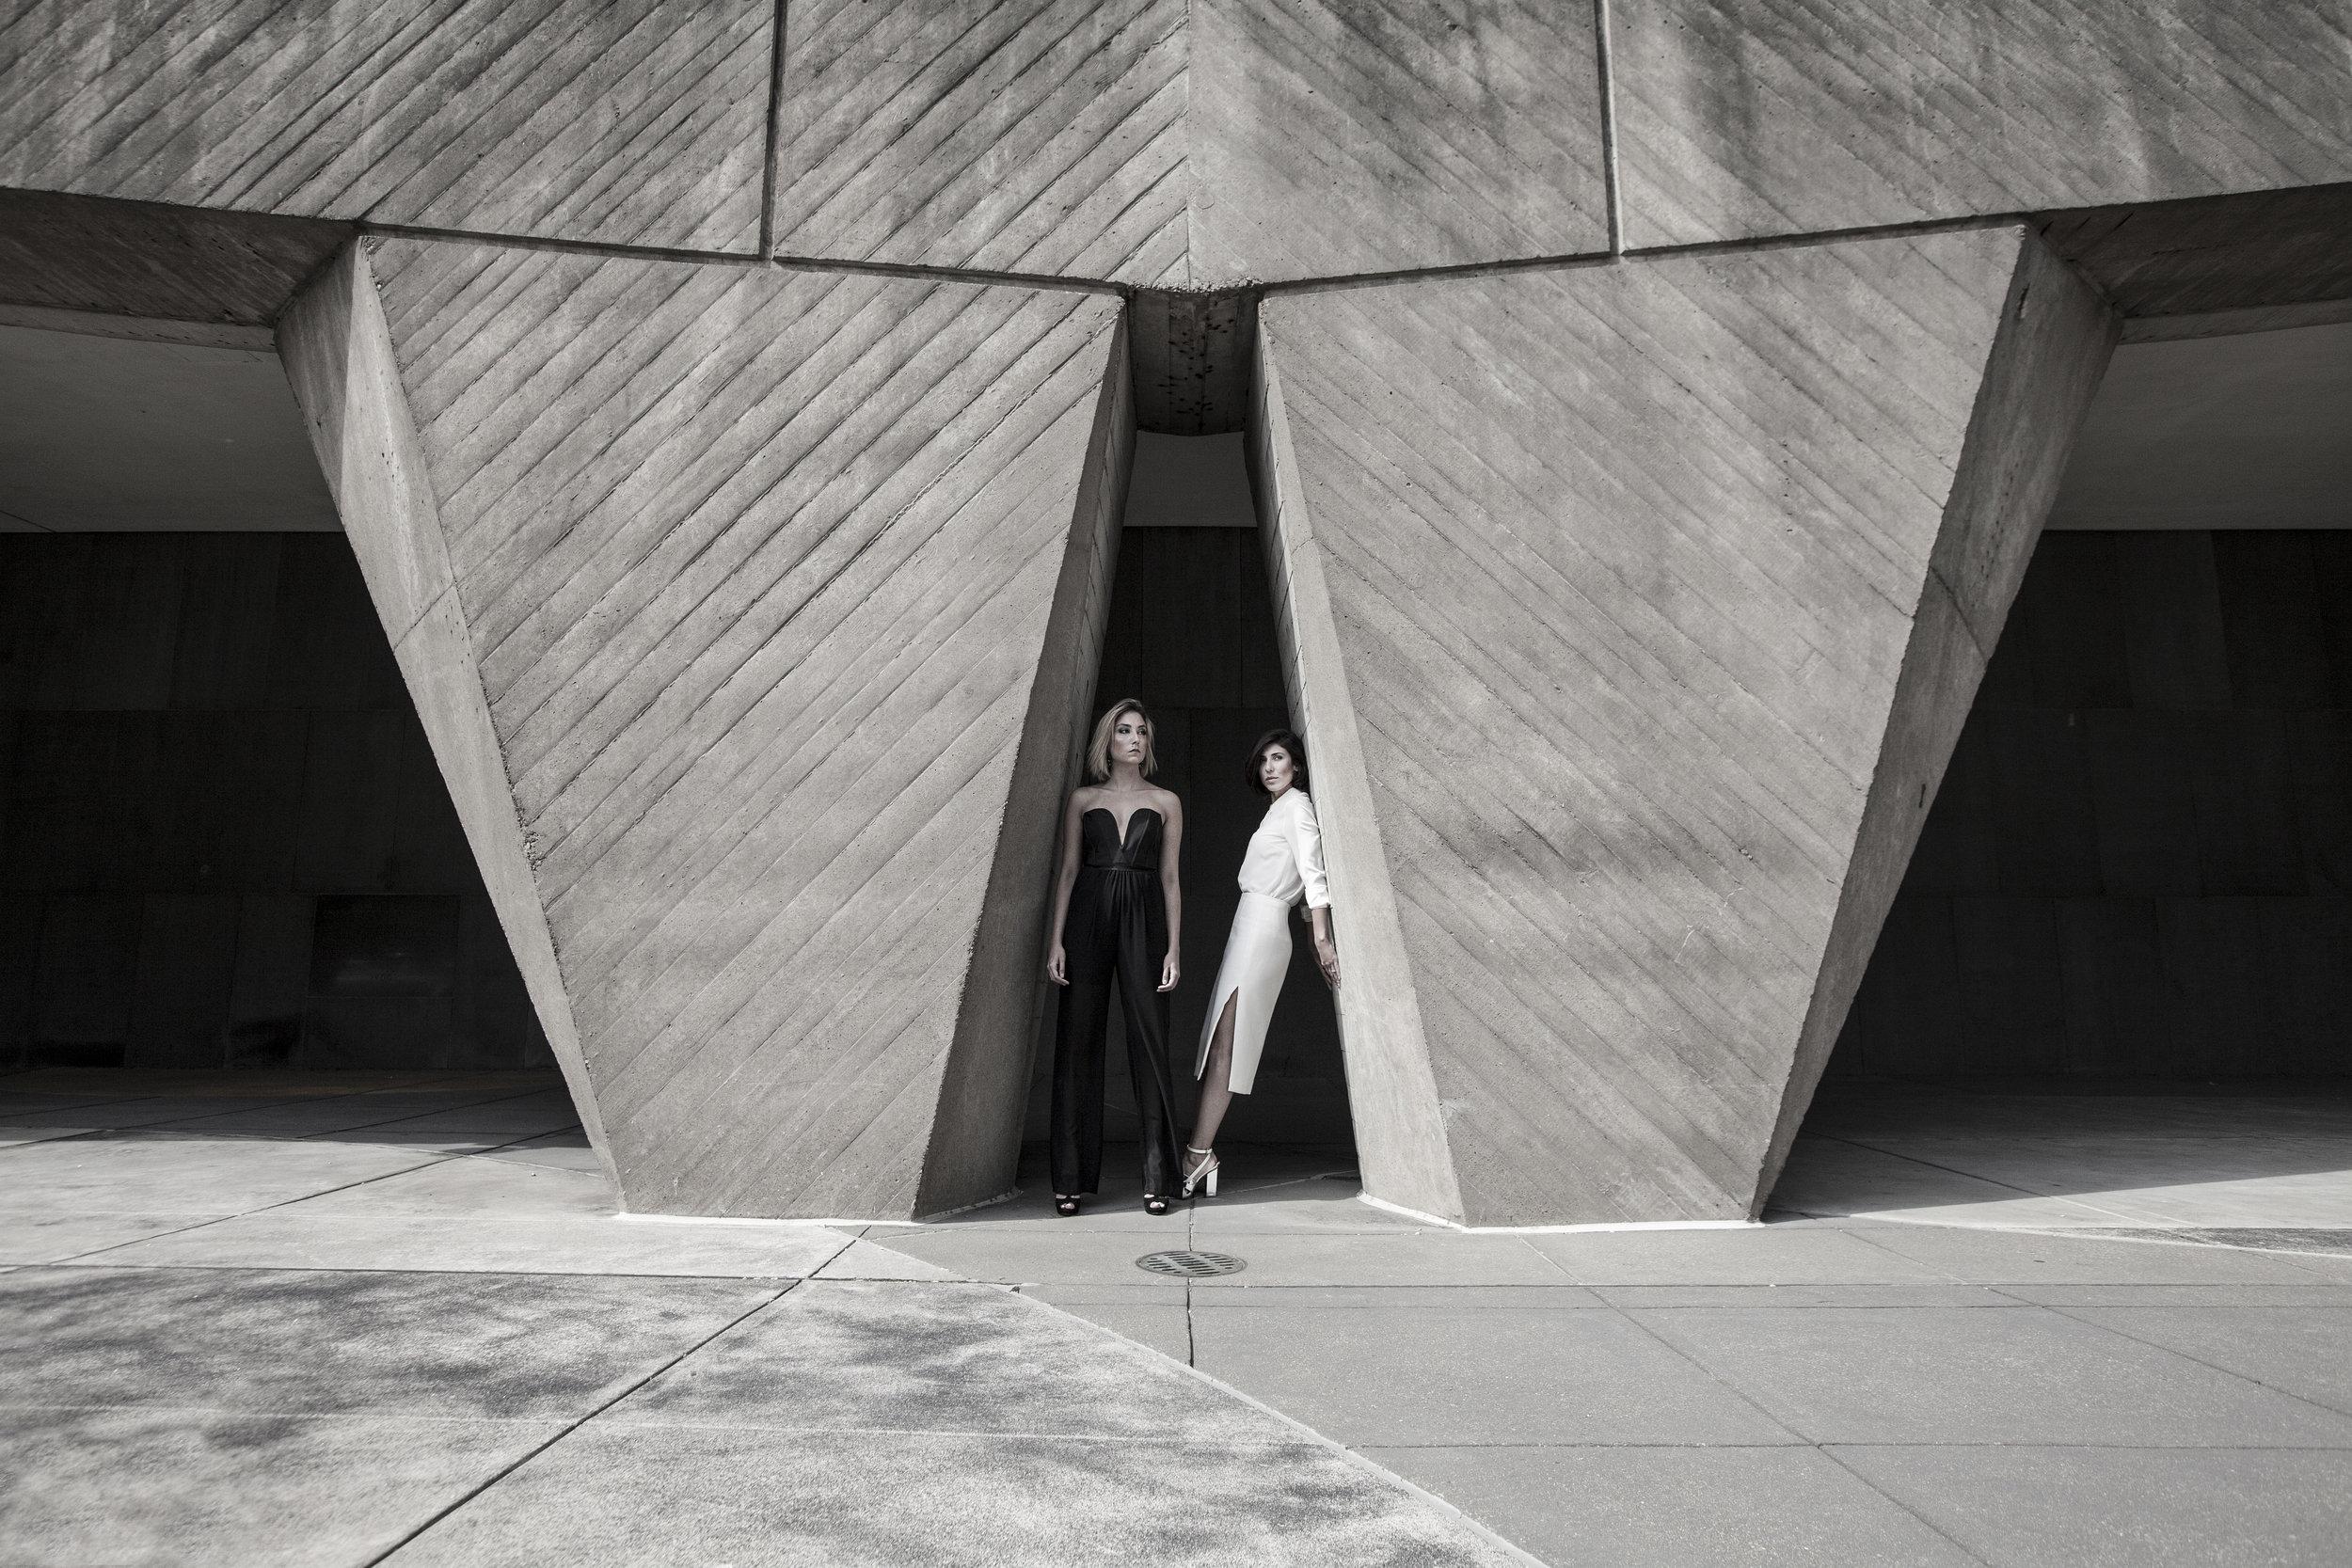 lifestyle-editorial-washington-dc-malek-naz-photography-fashion-model-housing-department.jpg